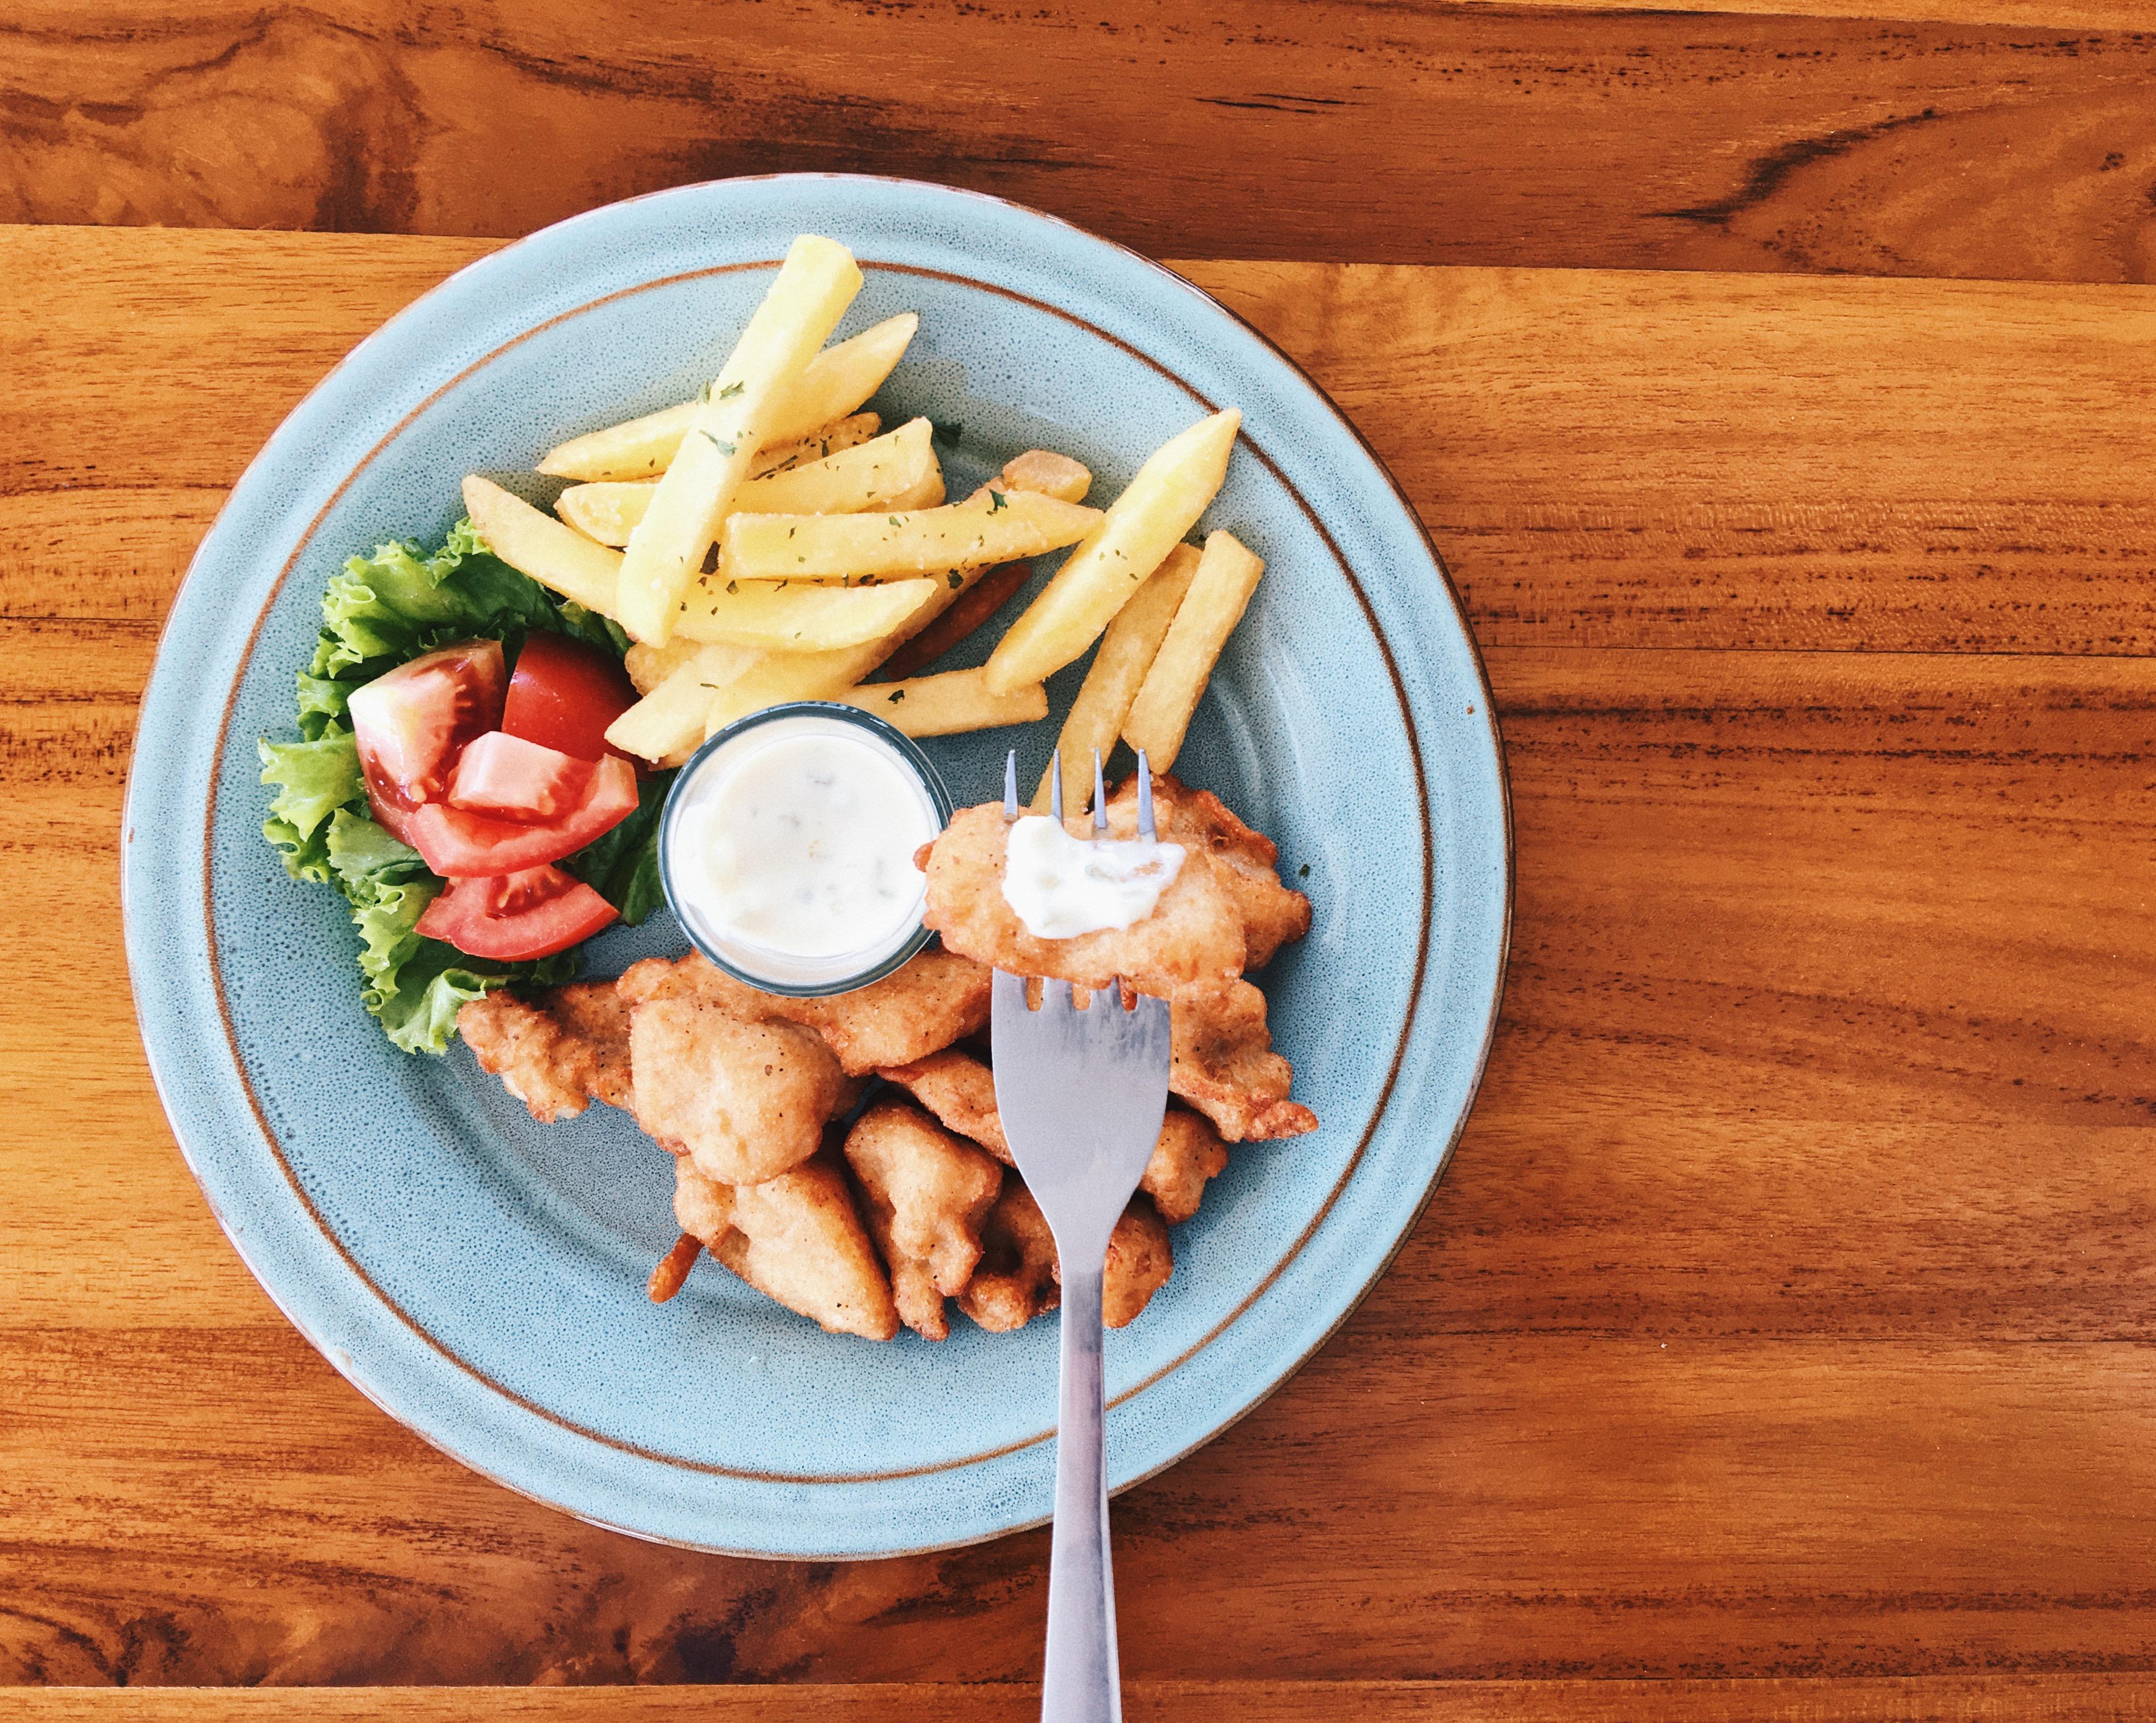 Escape Bajo - Food on Fork